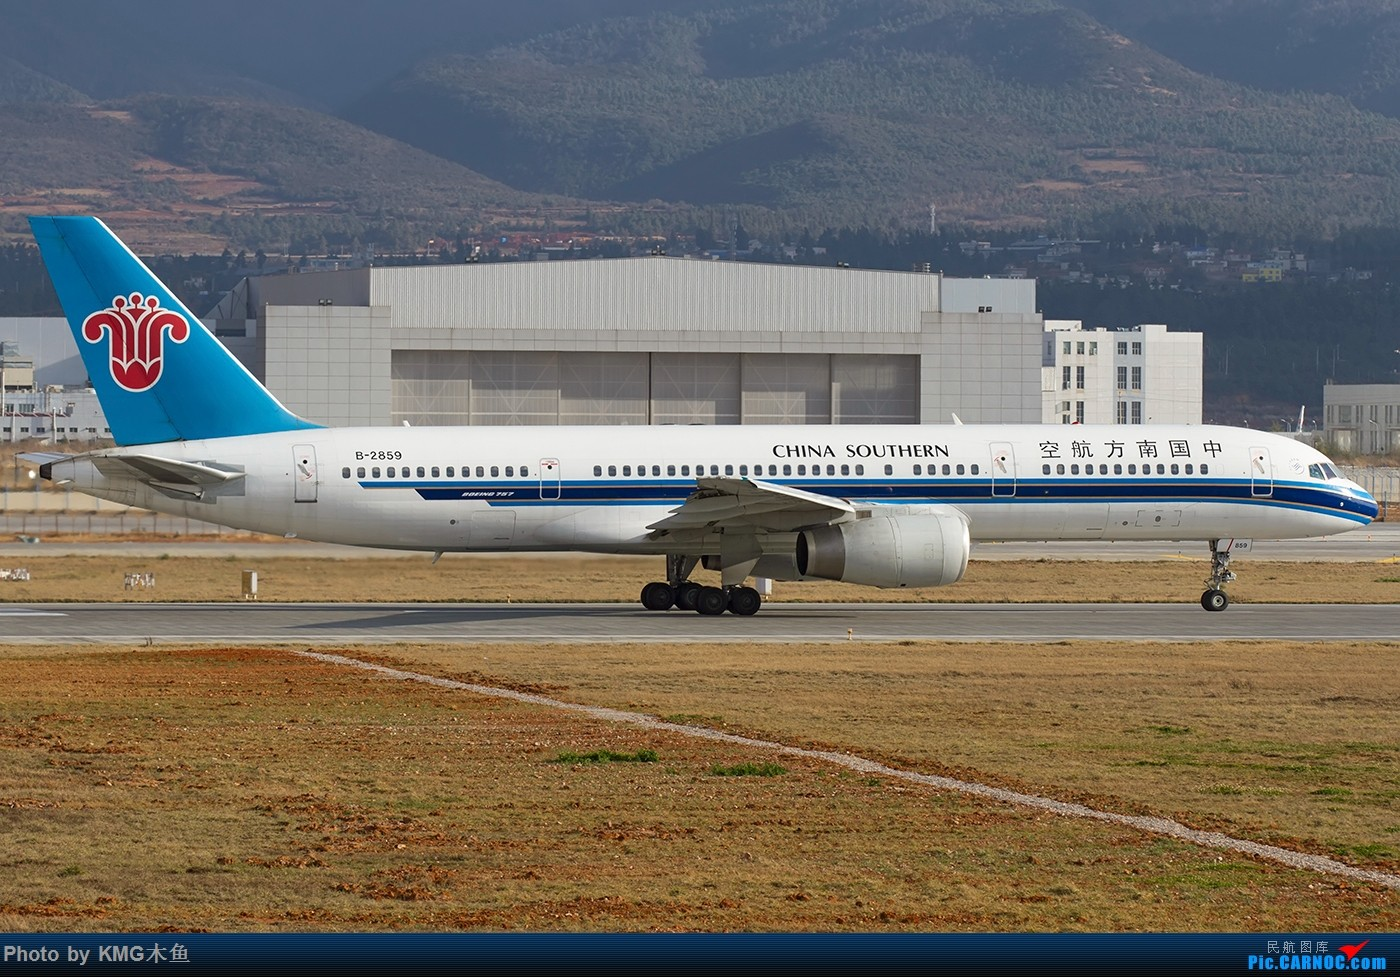 Re:[原创]【昆明飞友会-KMG木鱼】在长水国际机场,遇见英航云南,还是落地的 BOEING 757-200 B-2859 中国昆明长水国际机场